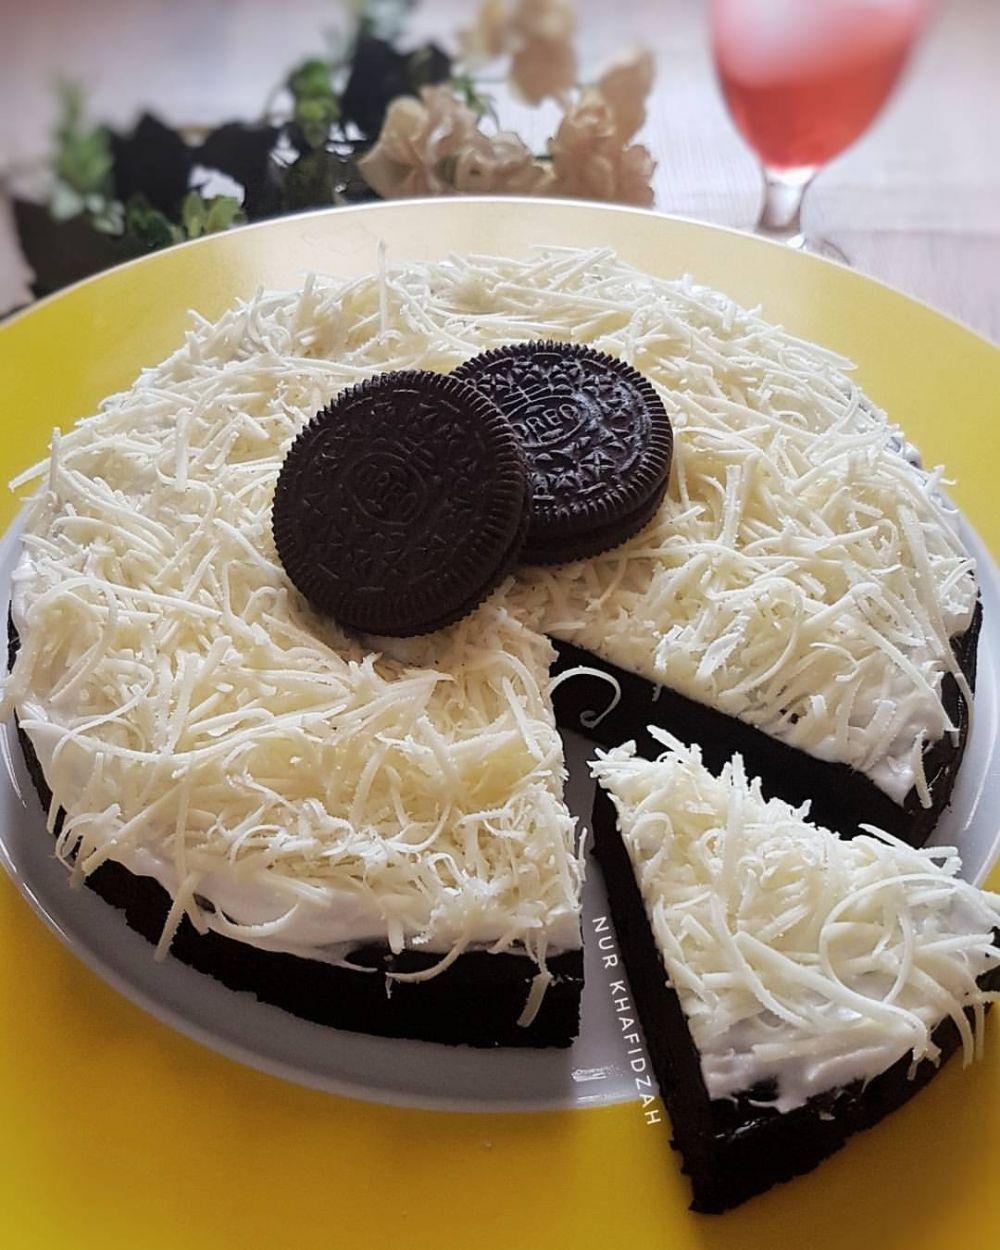 Resep Kue Basah Untuk Lebaran Instagram Resep Kue Makanan Kue Lezat